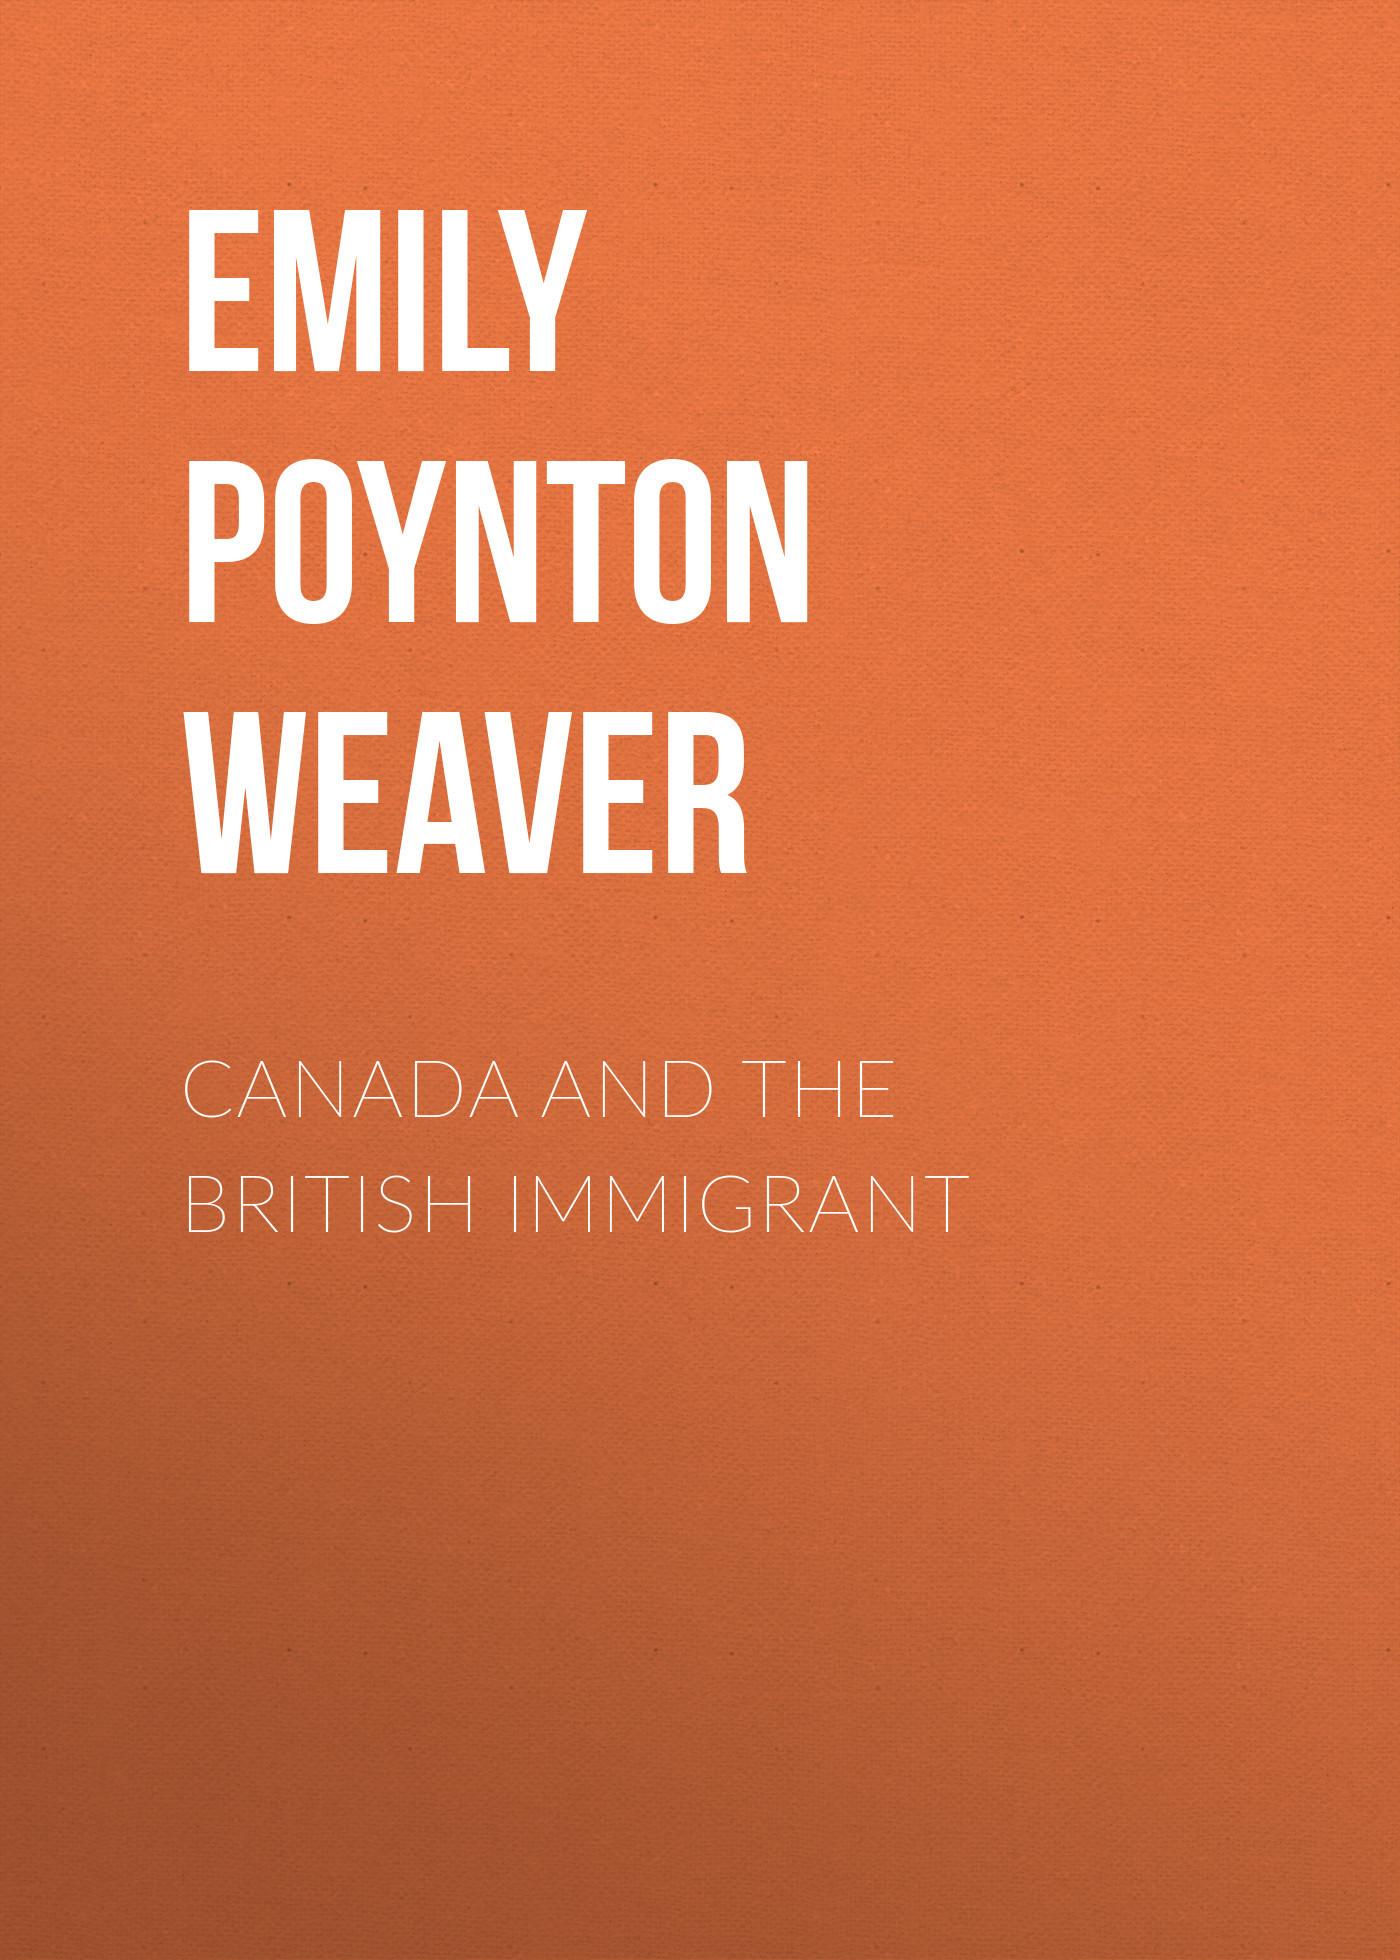 Emily Poynton Weaver Canada and the British immigrant emily the strange футболка